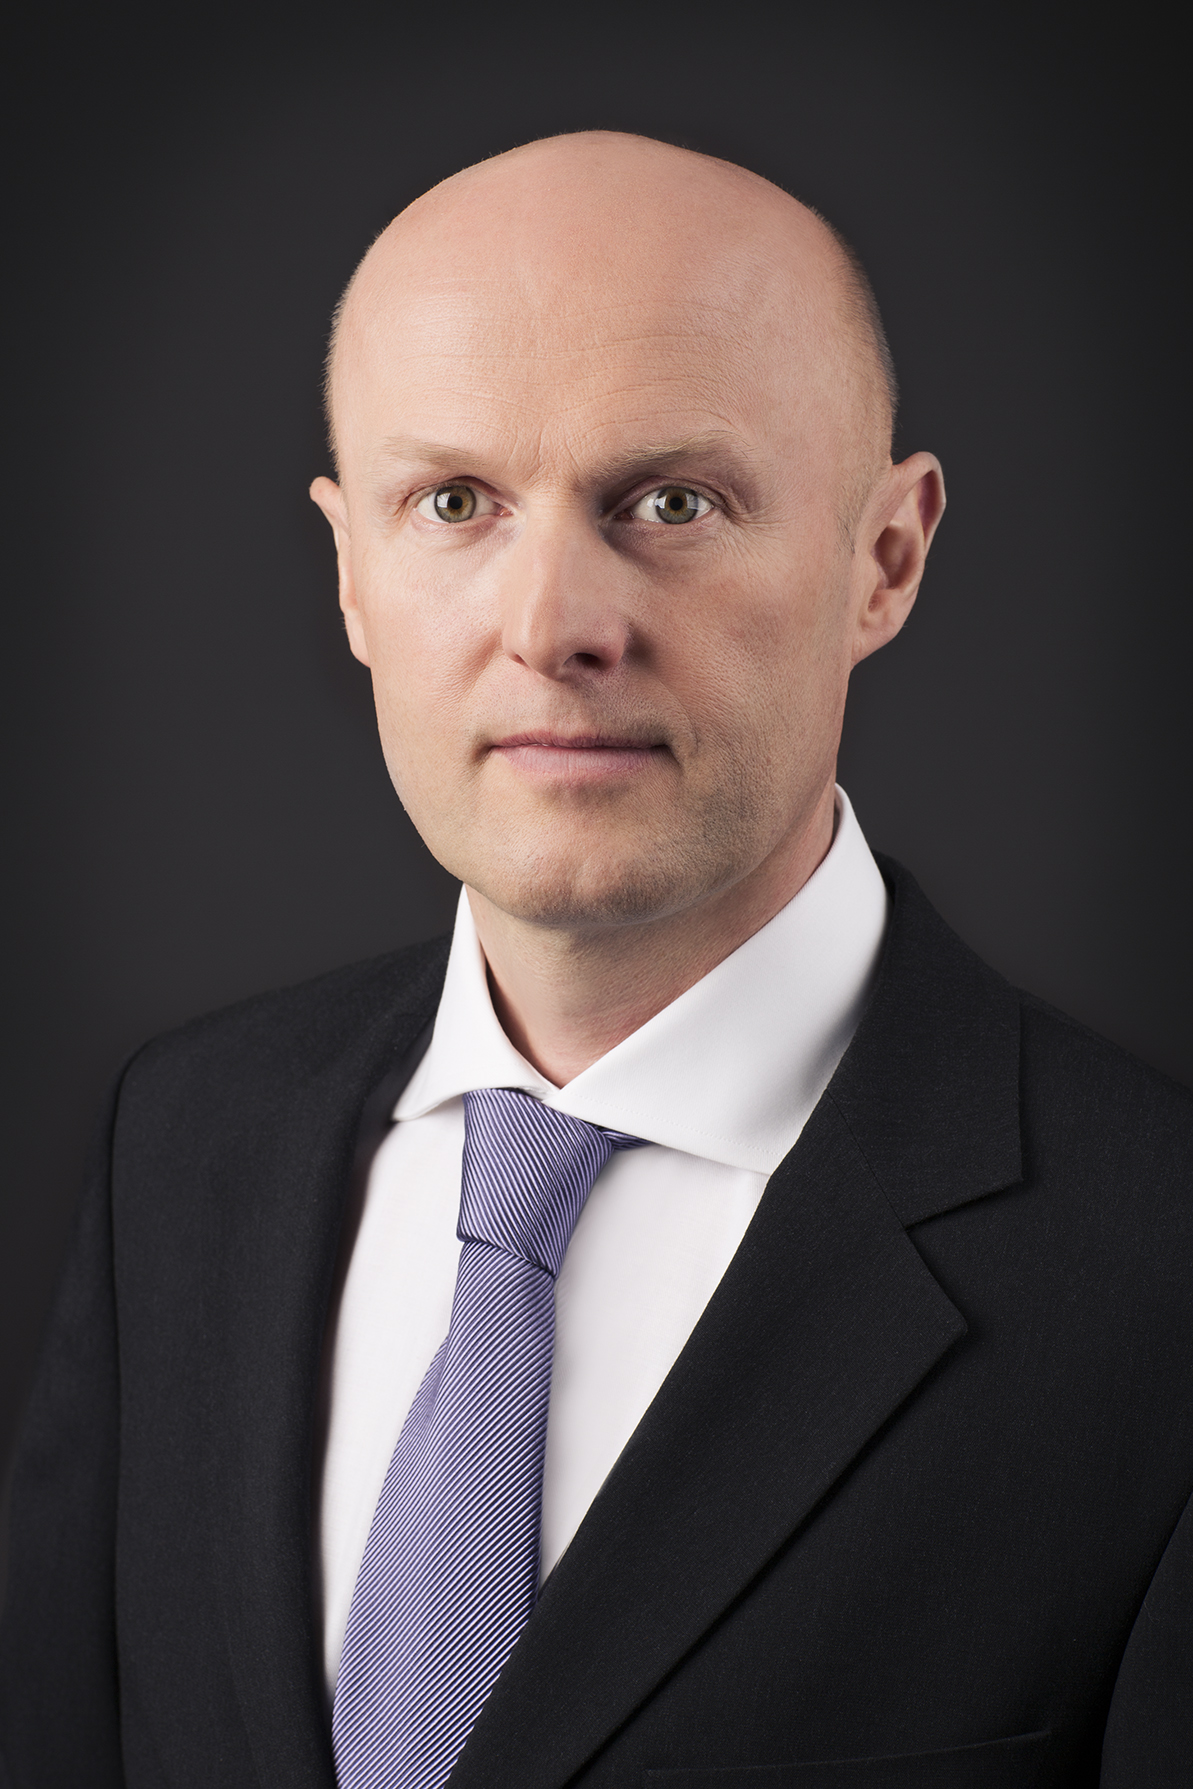 JUDr. Vladimír Gontkovič